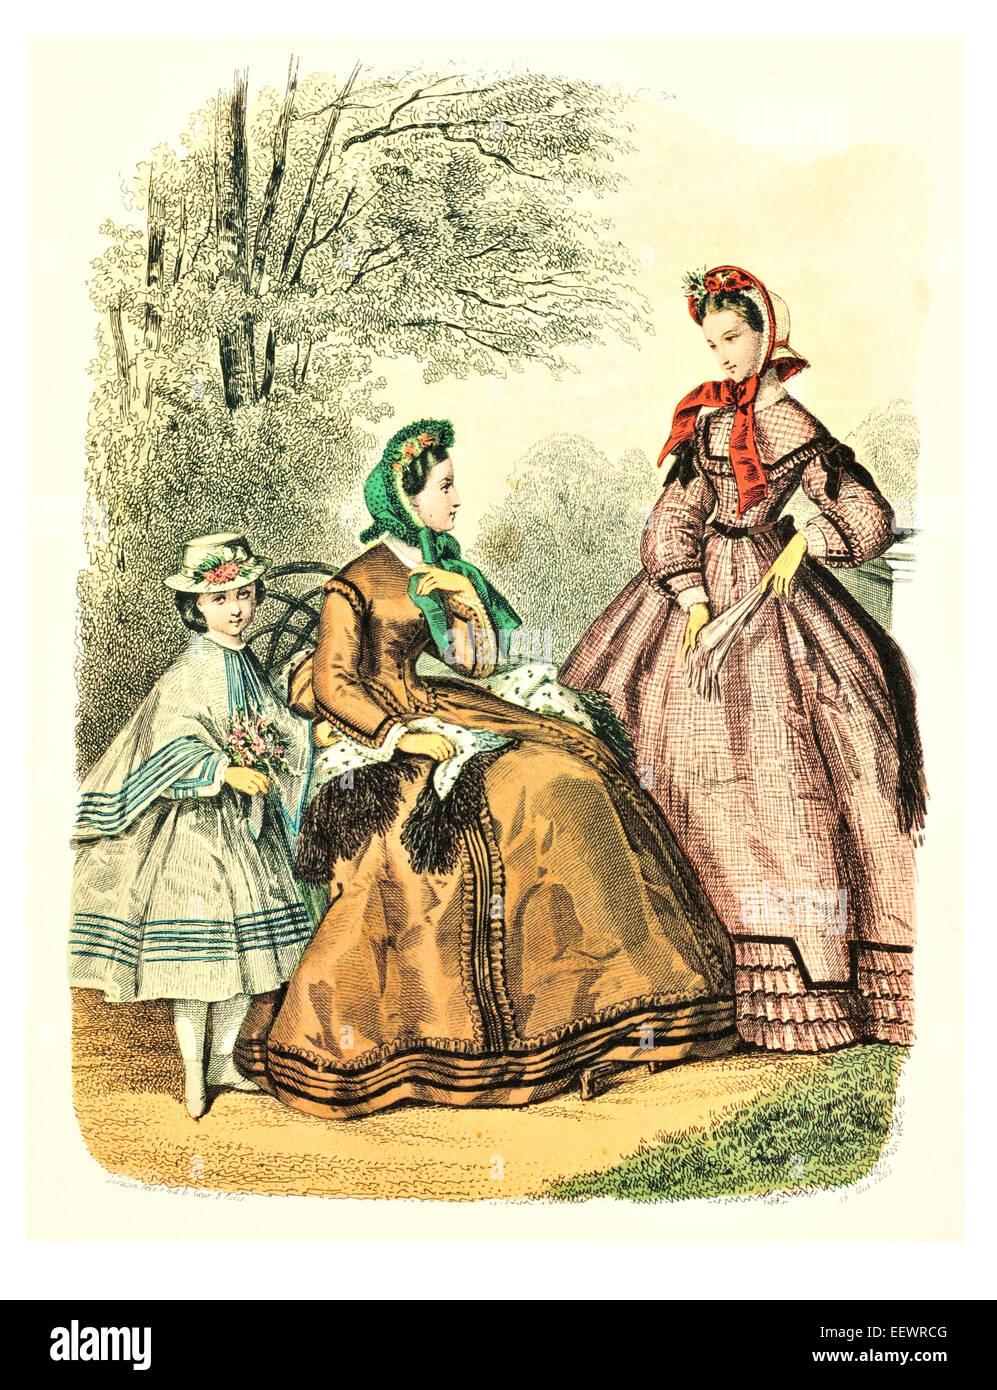 La Mode Illustree 1863 Victorian era period costume fashion dress gown gowns skirt veil cuff frills muslin cap embroidery Stock Photo